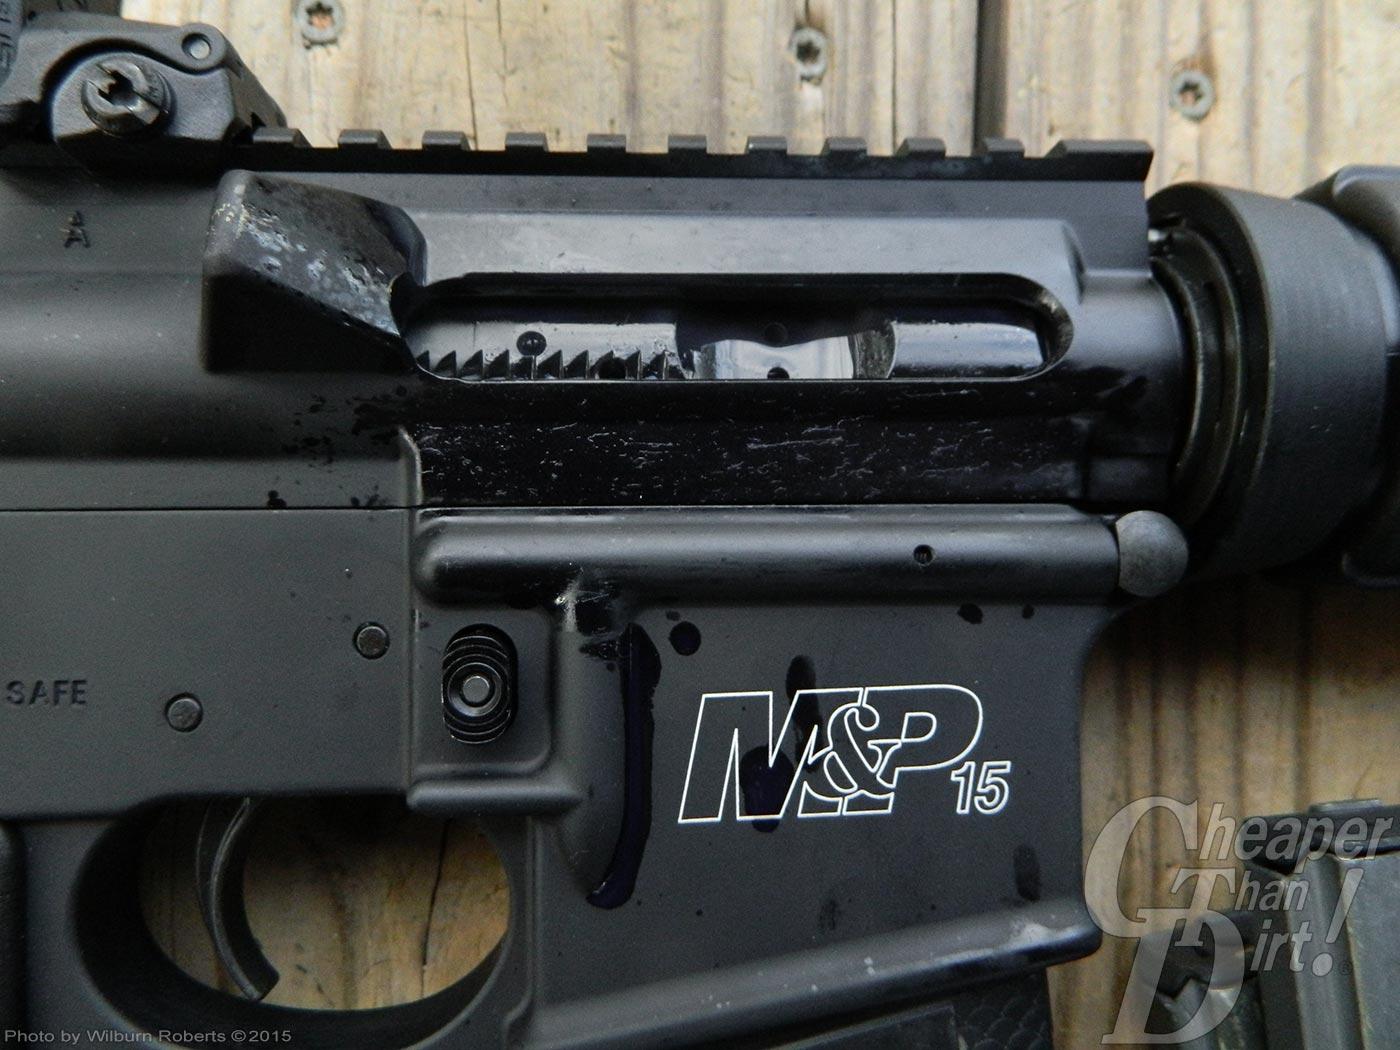 New Frontier Armory Ar 9 Modular 9mm Bolt Carrier Group – Fondos de